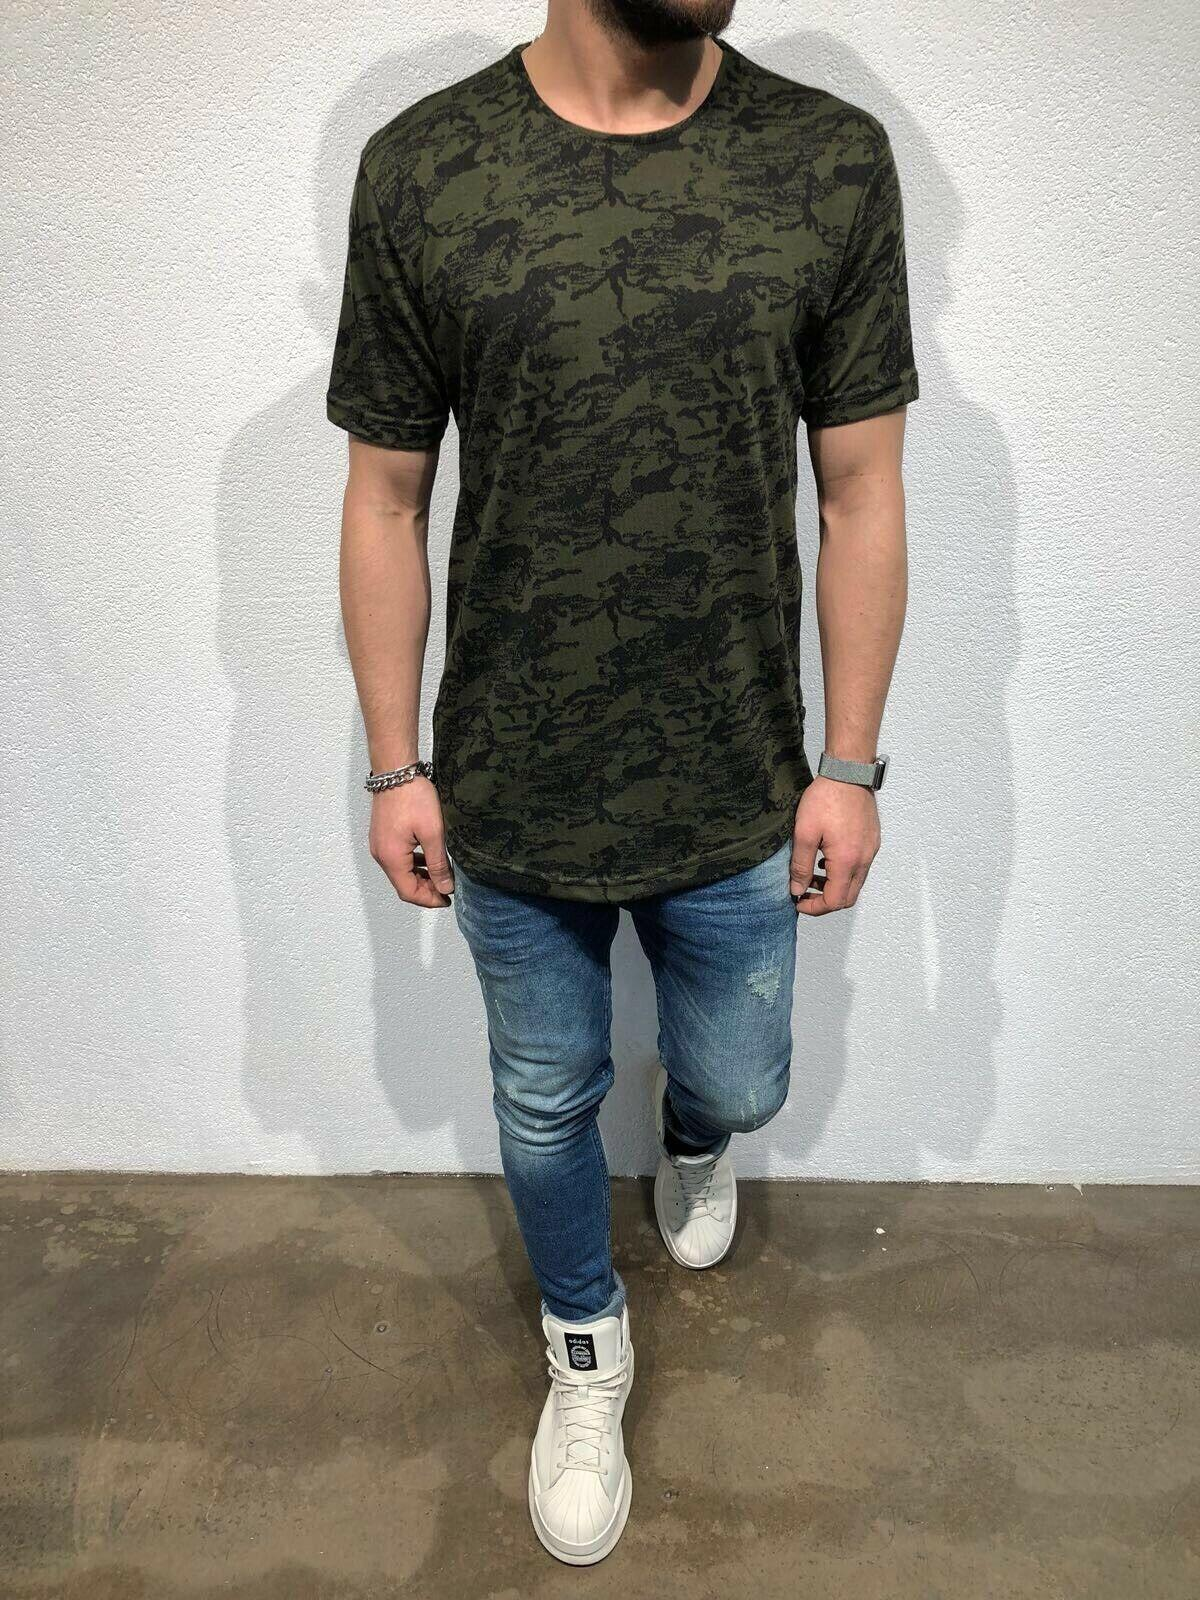 T militar shirt 2019 New Style tshirt Homens Verão O Neck manga curta Camouflage Tops Causal Cotton T-shirt solto shirt Tee masculino